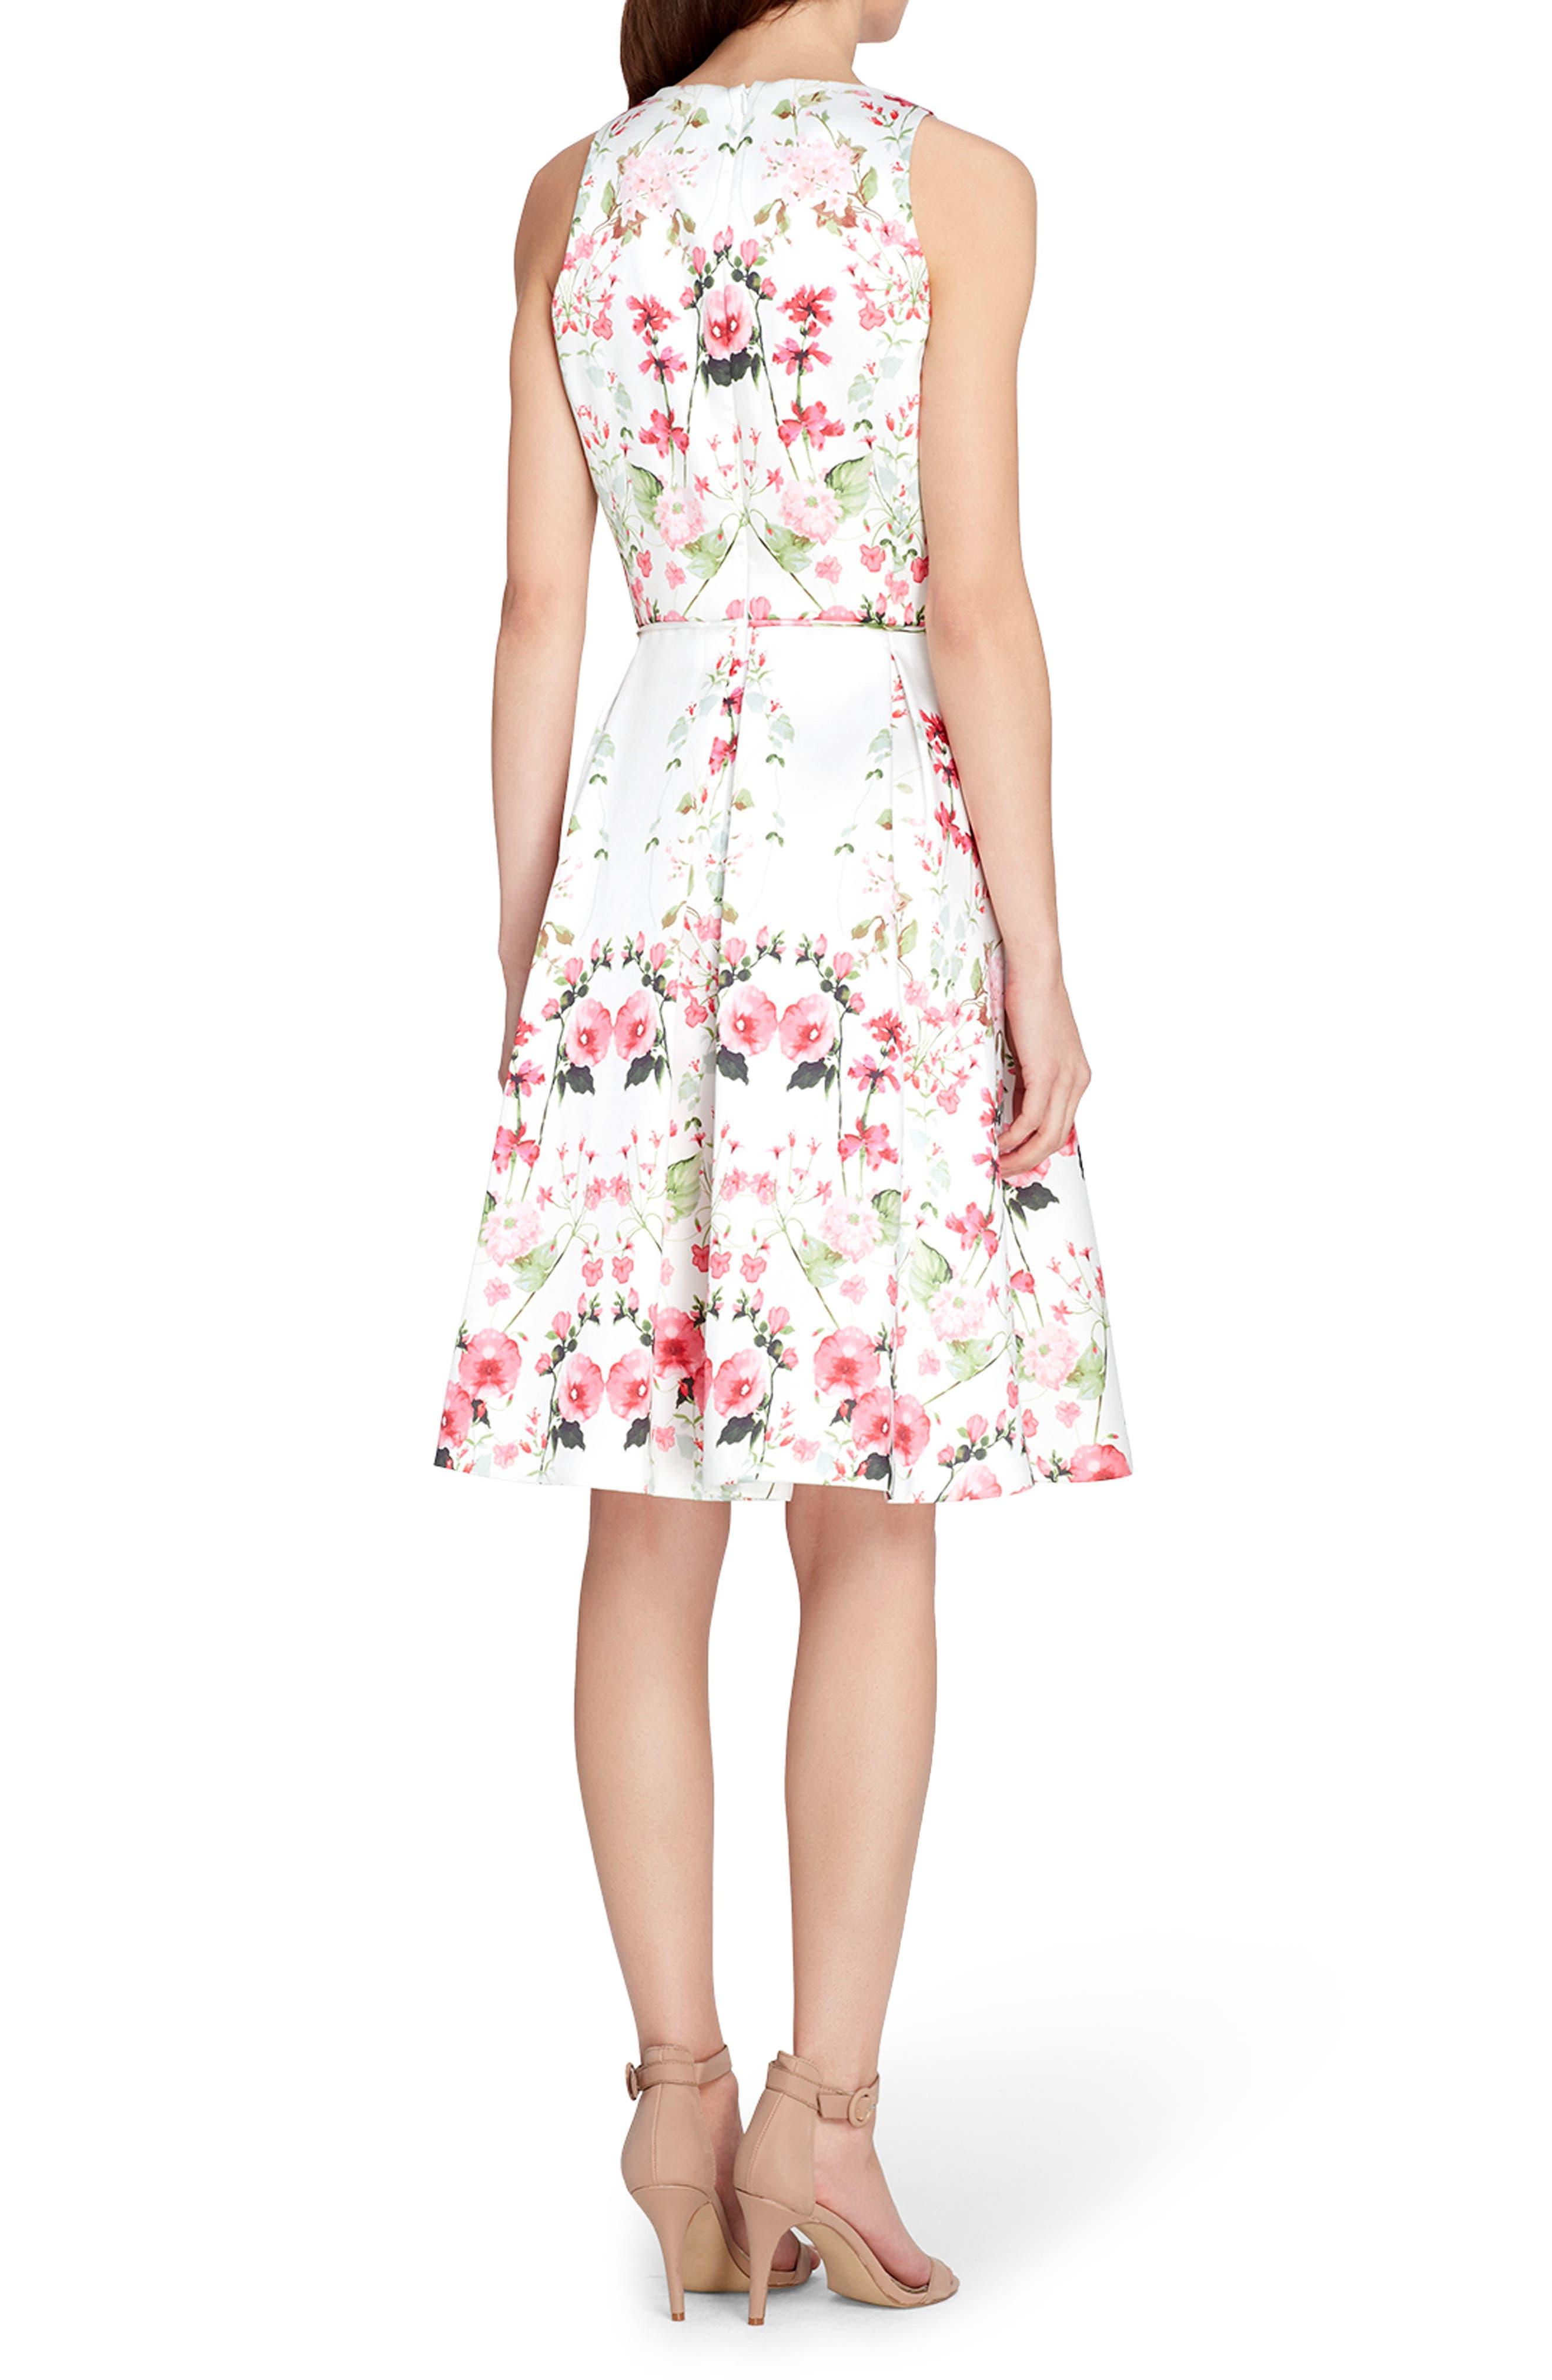 Micado Floral Print Fit & Flare Dress,                             Alternate thumbnail 2, color,                             907